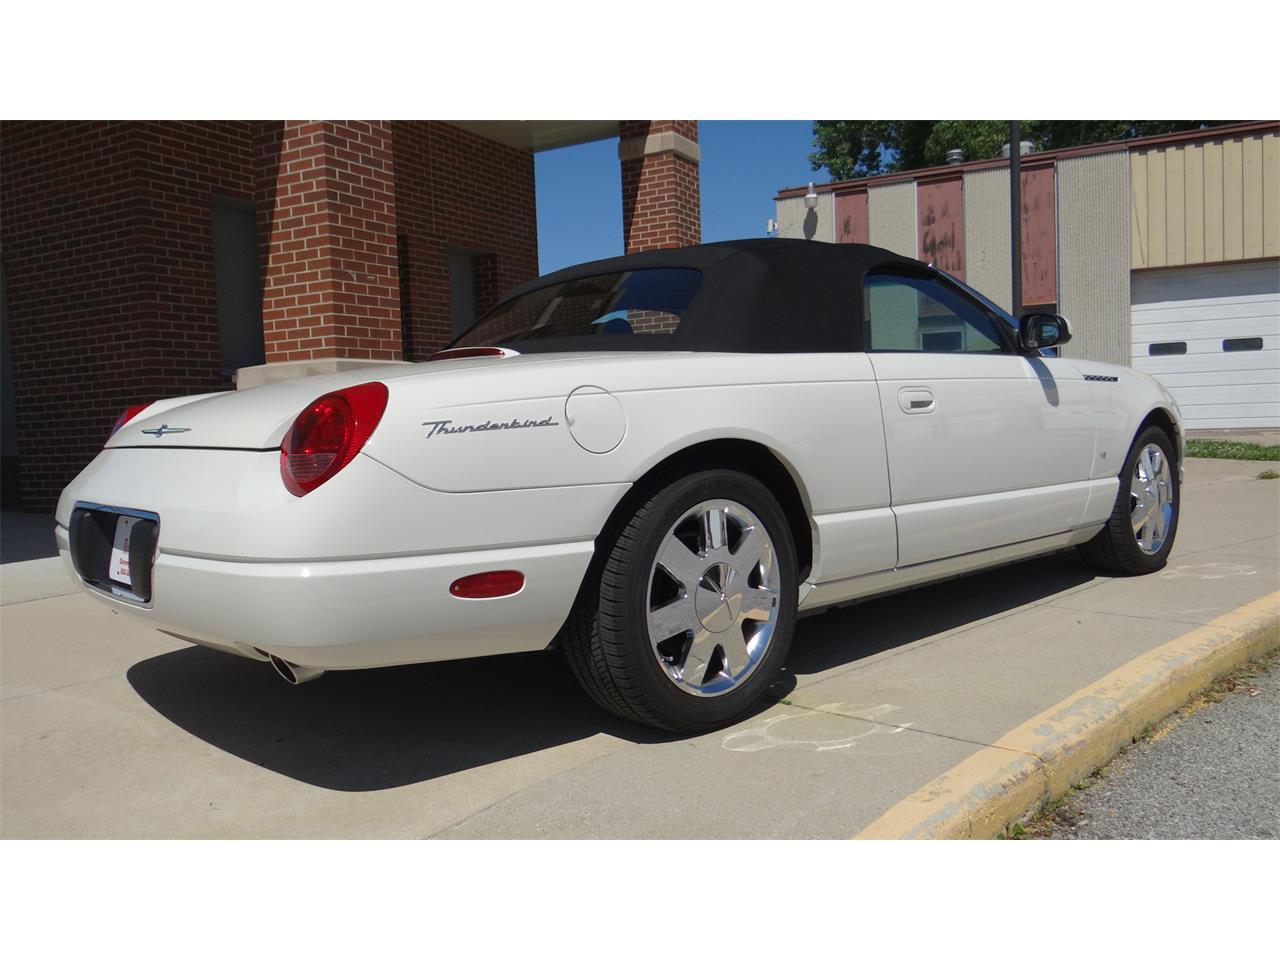 2003 Ford Thunderbird (CC-1357302) for sale in Davenport, Iowa